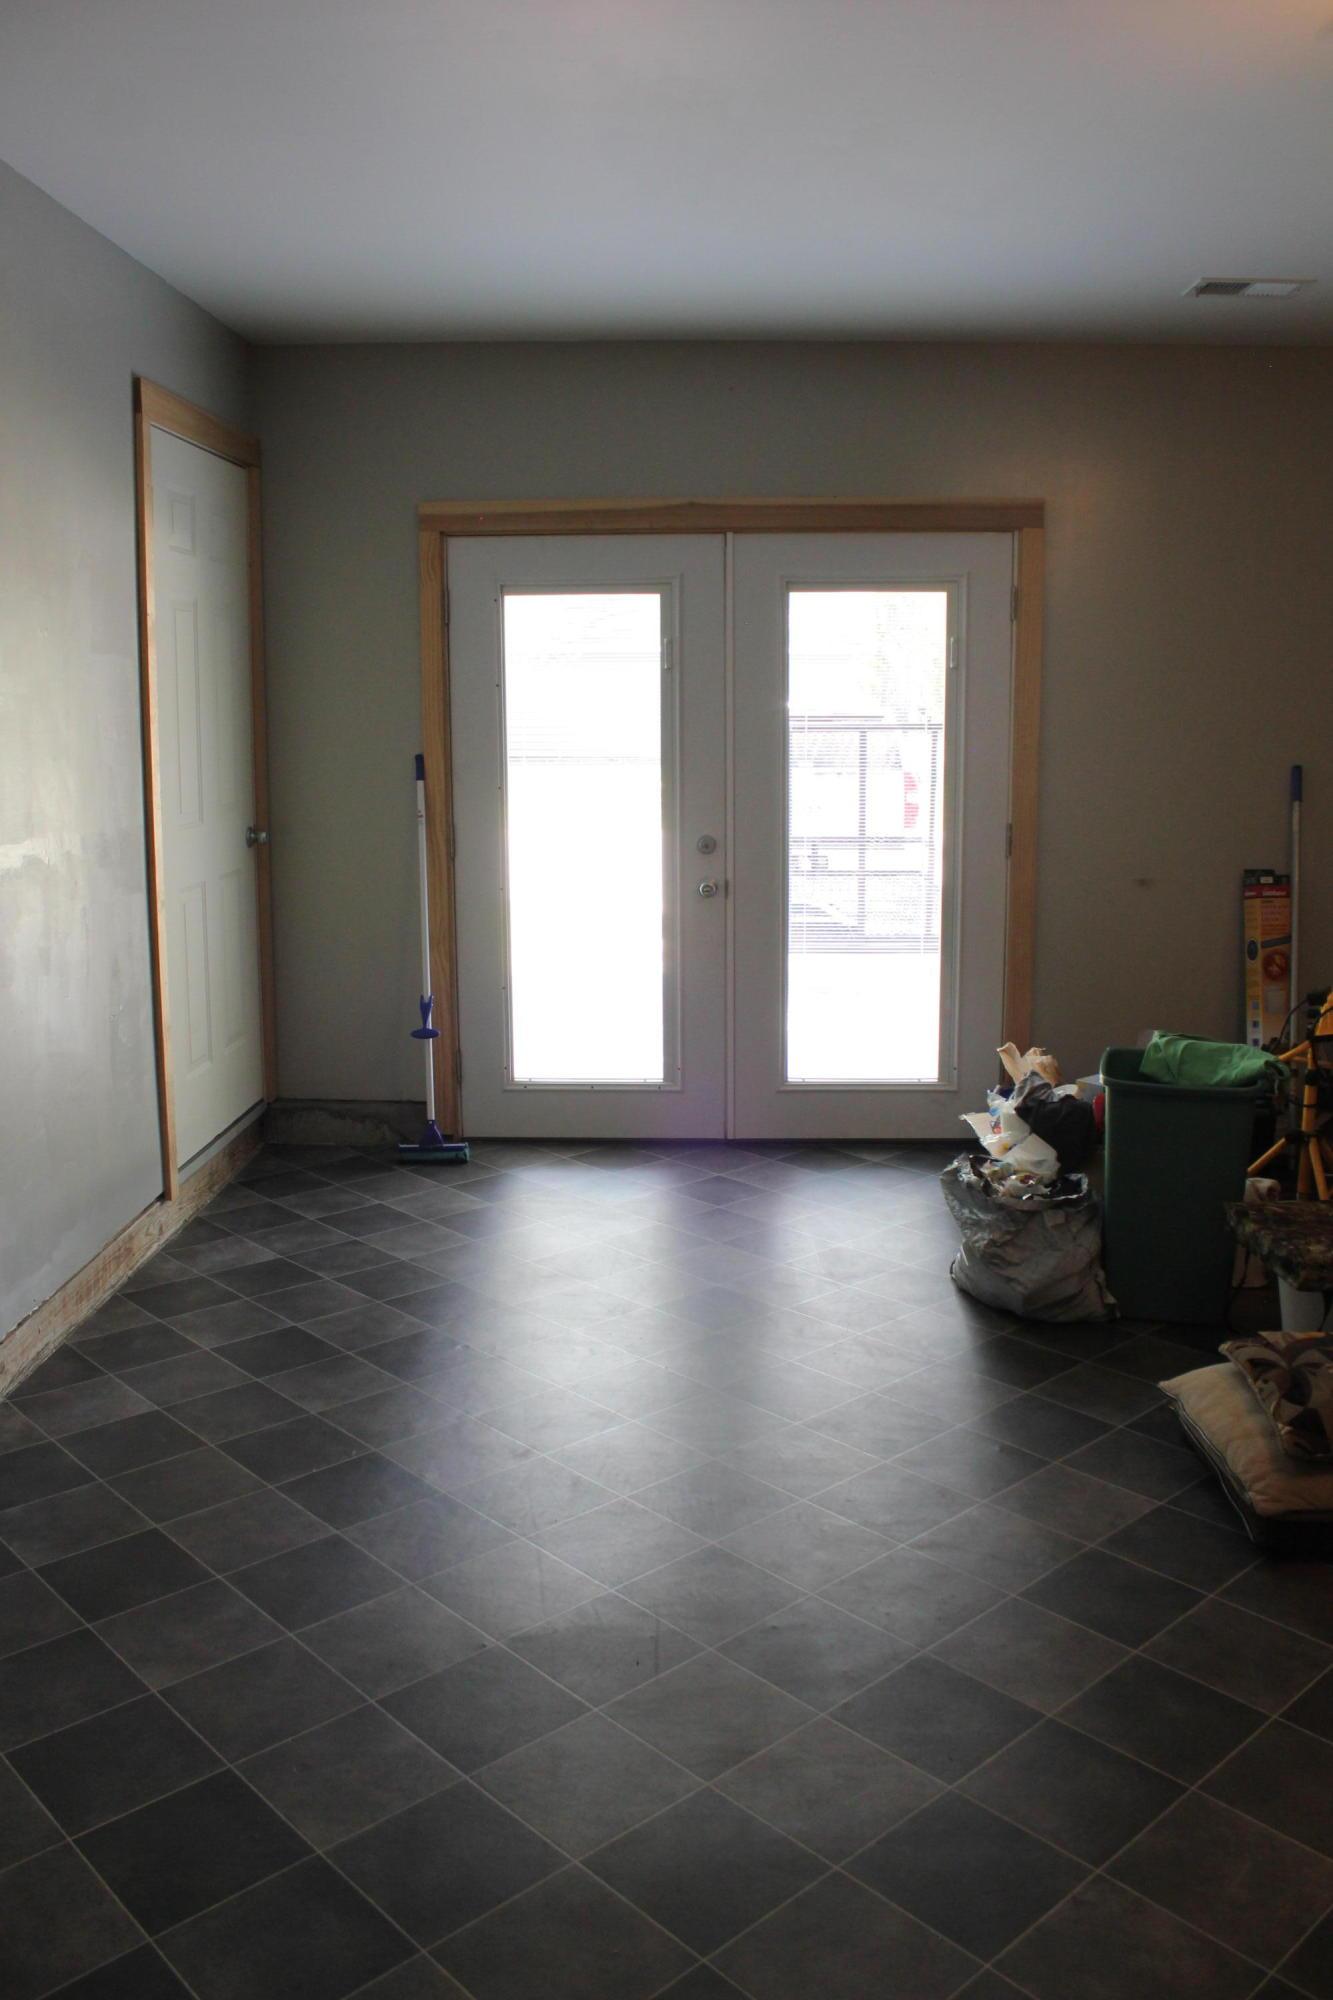 Ashleytowne Landing Homes For Sale - 2726 Jobee, Charleston, SC - 10